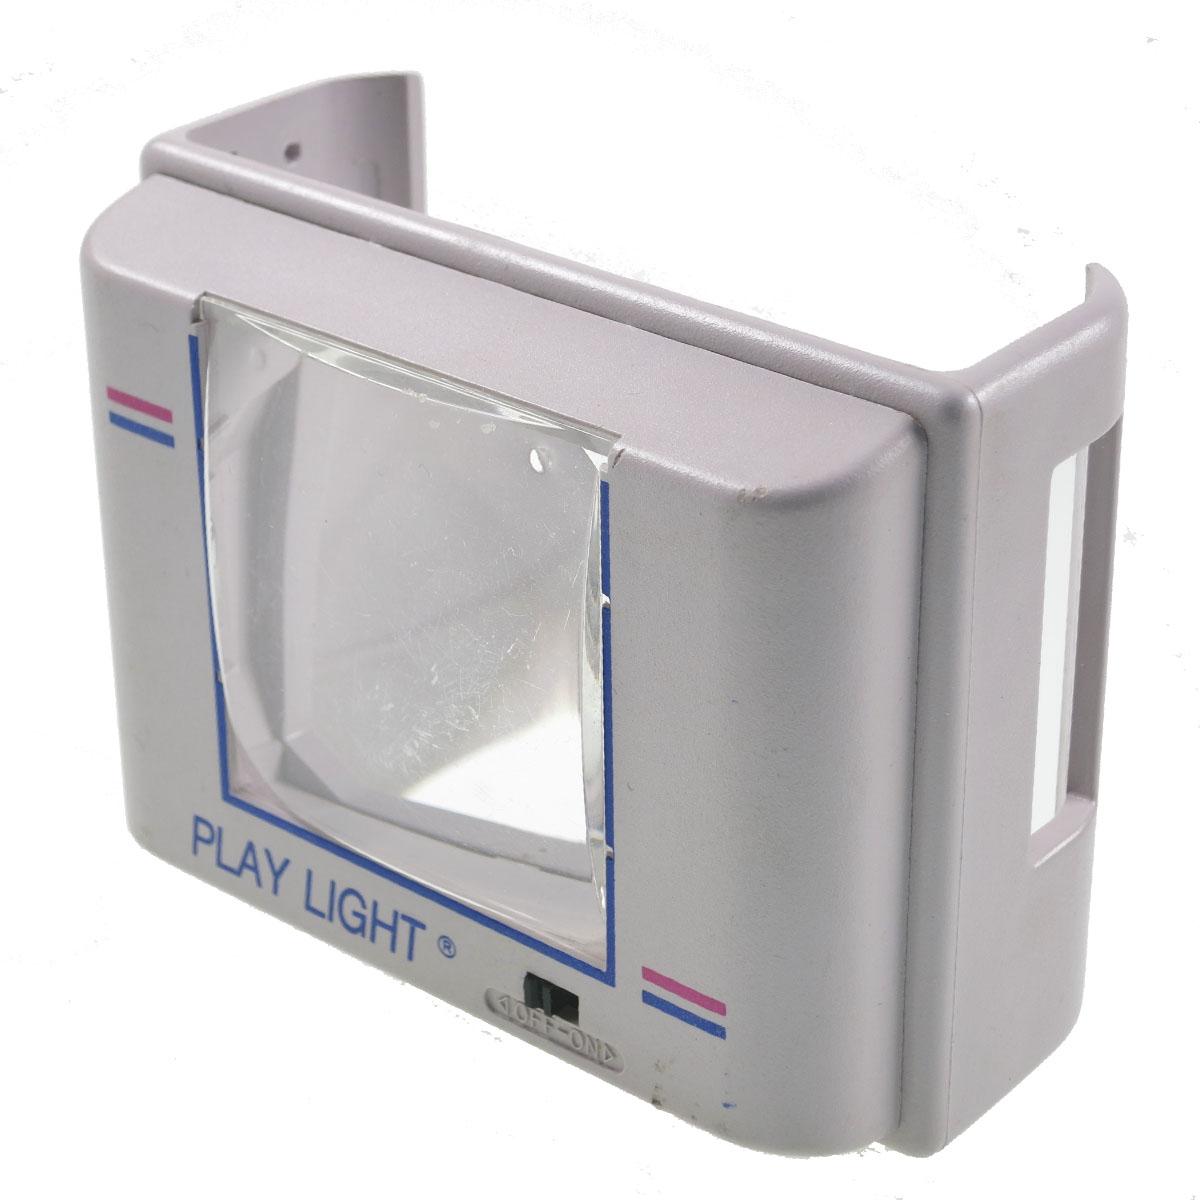 Light GameBoy Play Light Beleuchtung Zubehör Game Boy GUTER Zustand ...